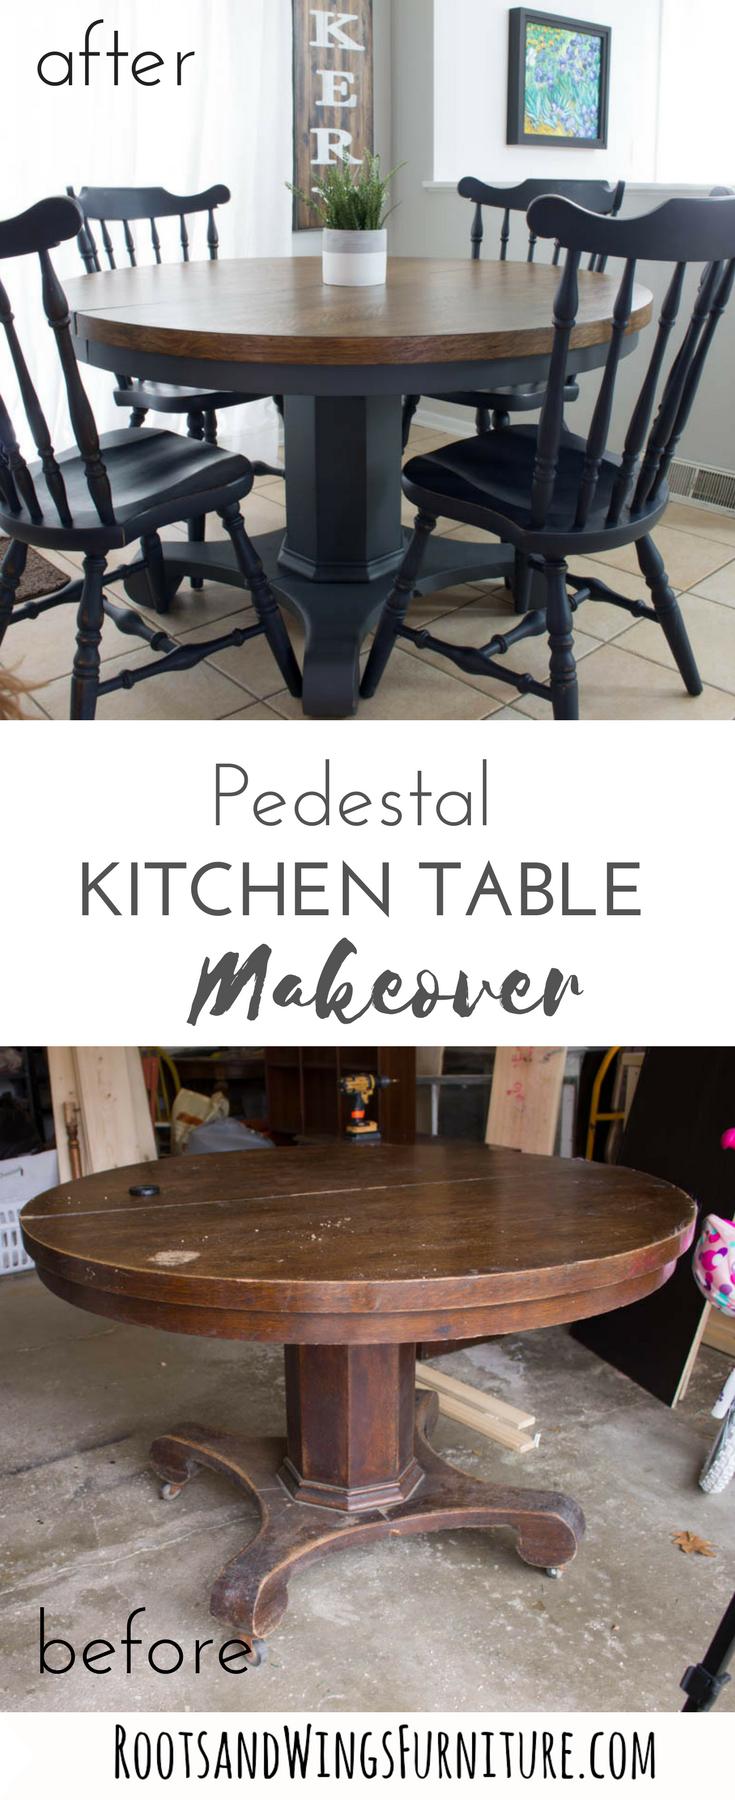 Pedestal Kitchen Table Makeover Dining Table Makeover regarding measurements 735 X 1800